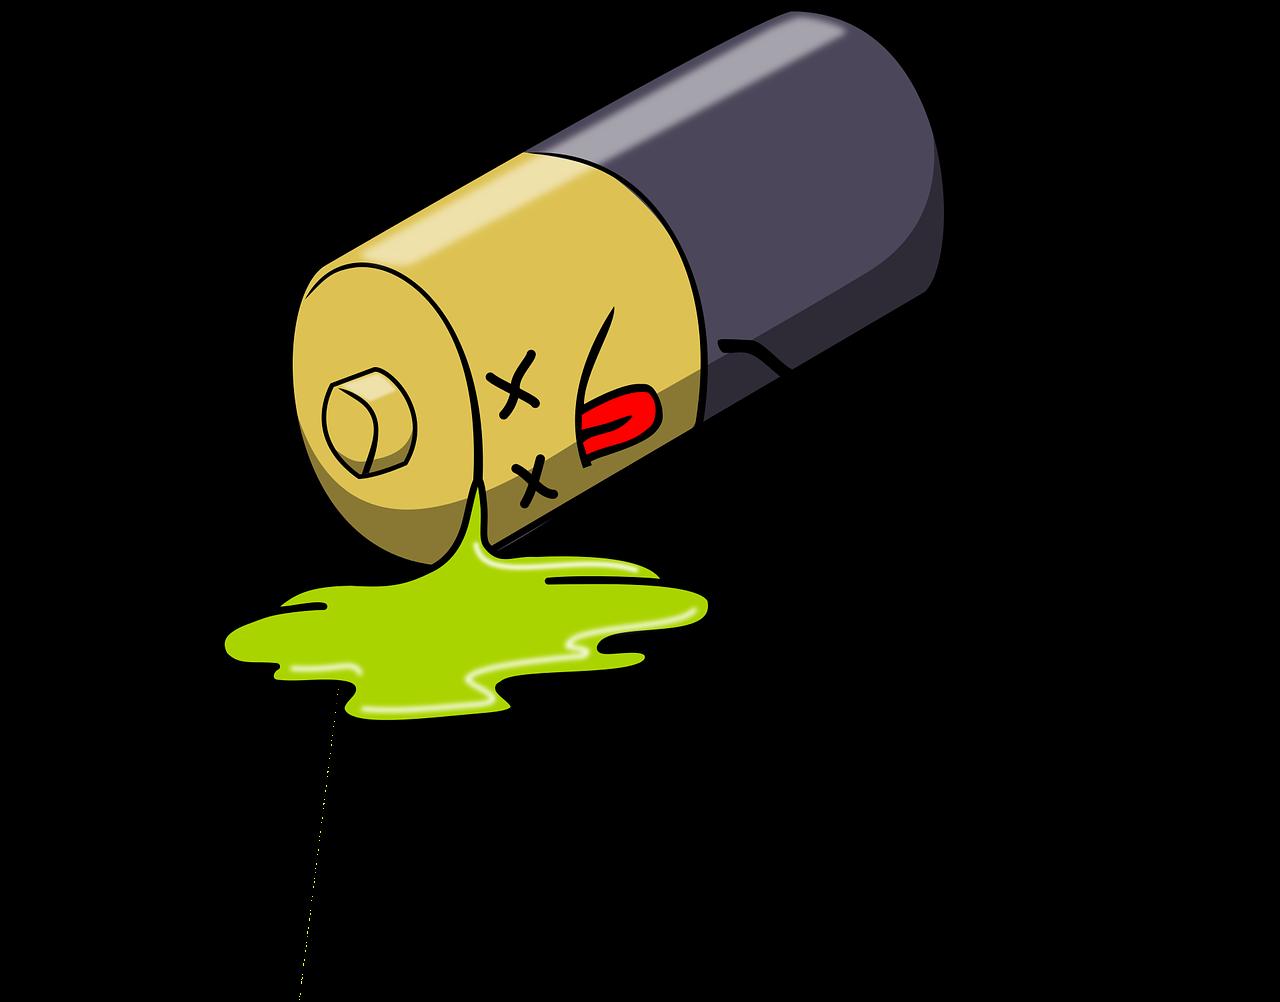 dead-battery-1623377_1280.png